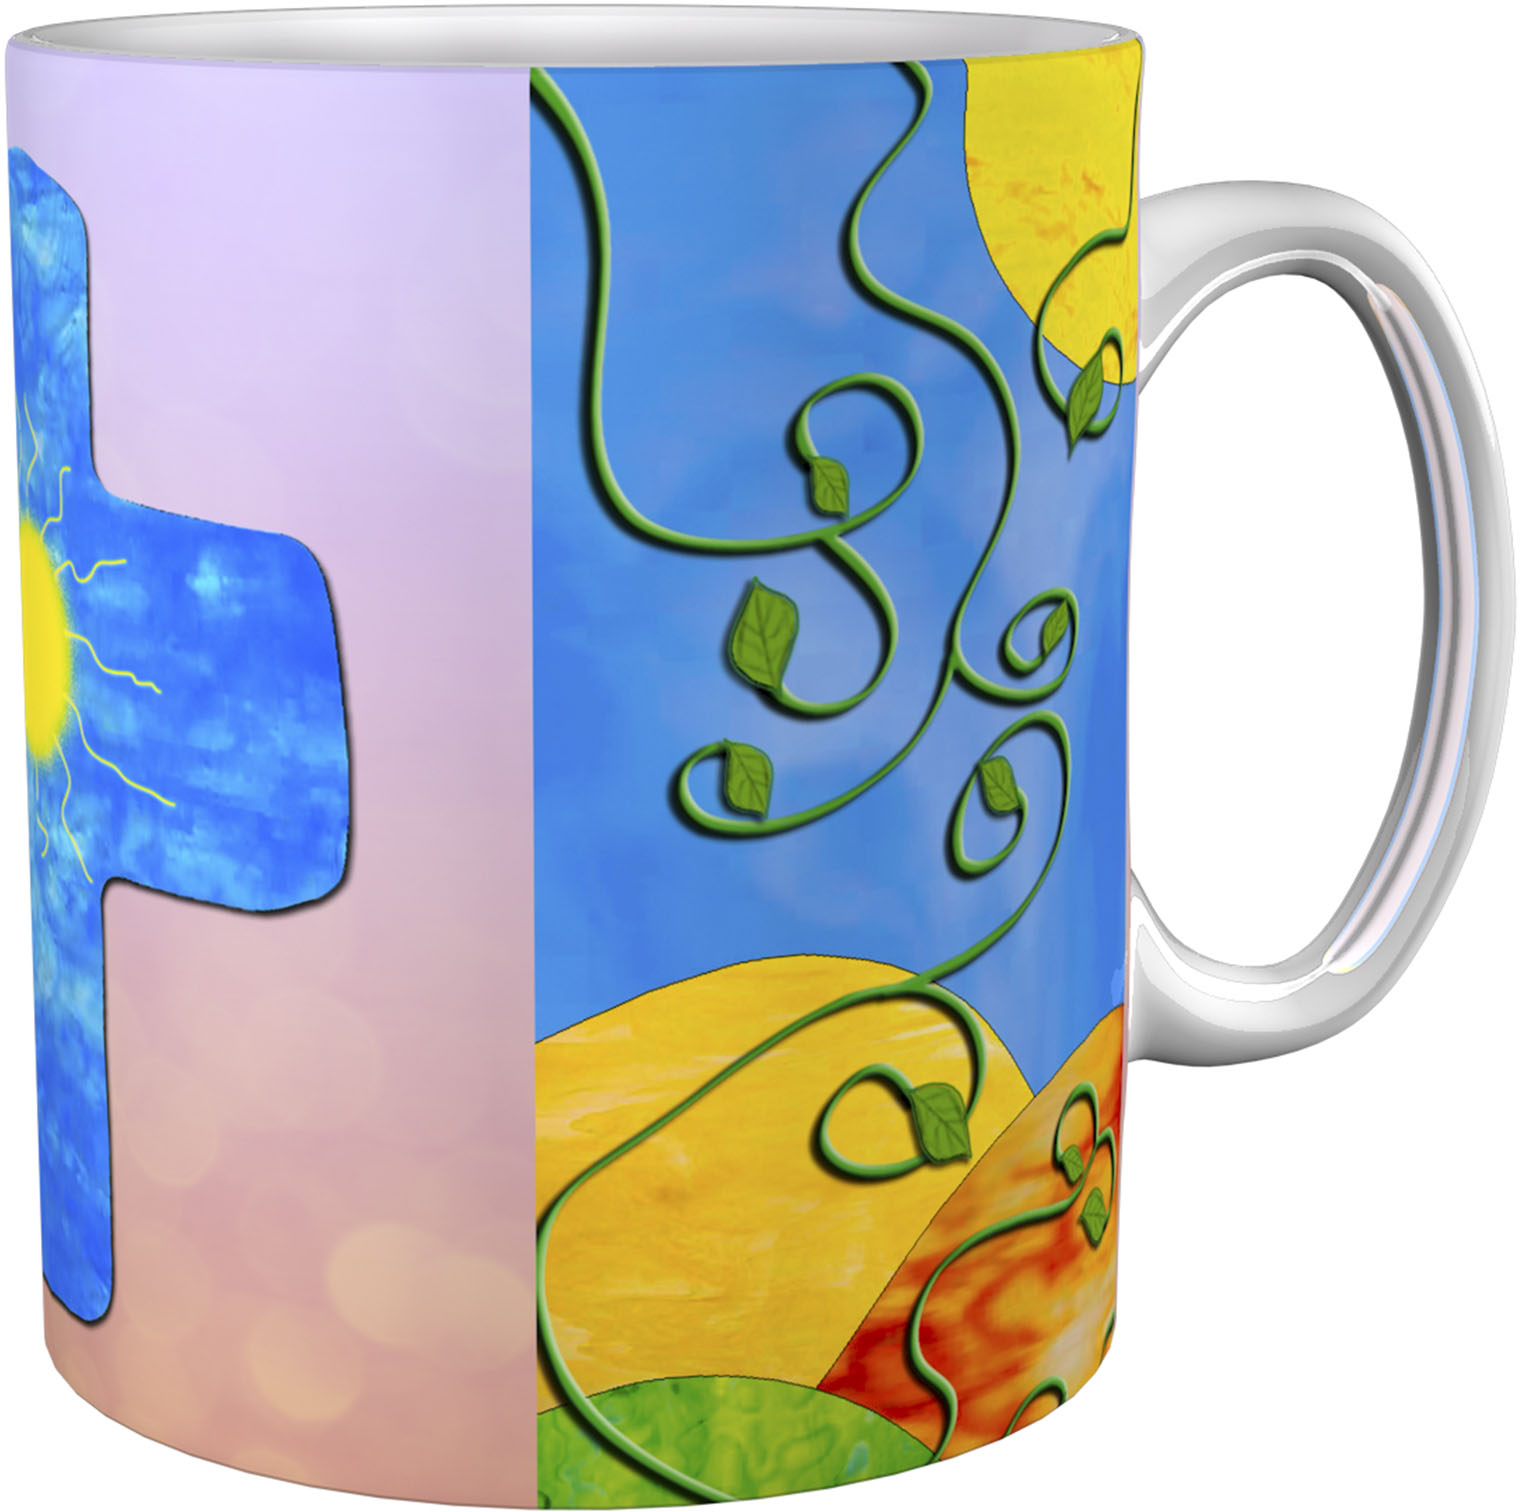 Kaffeetasse / Kaffeebecher / Kreuz / Sonne / Christlich